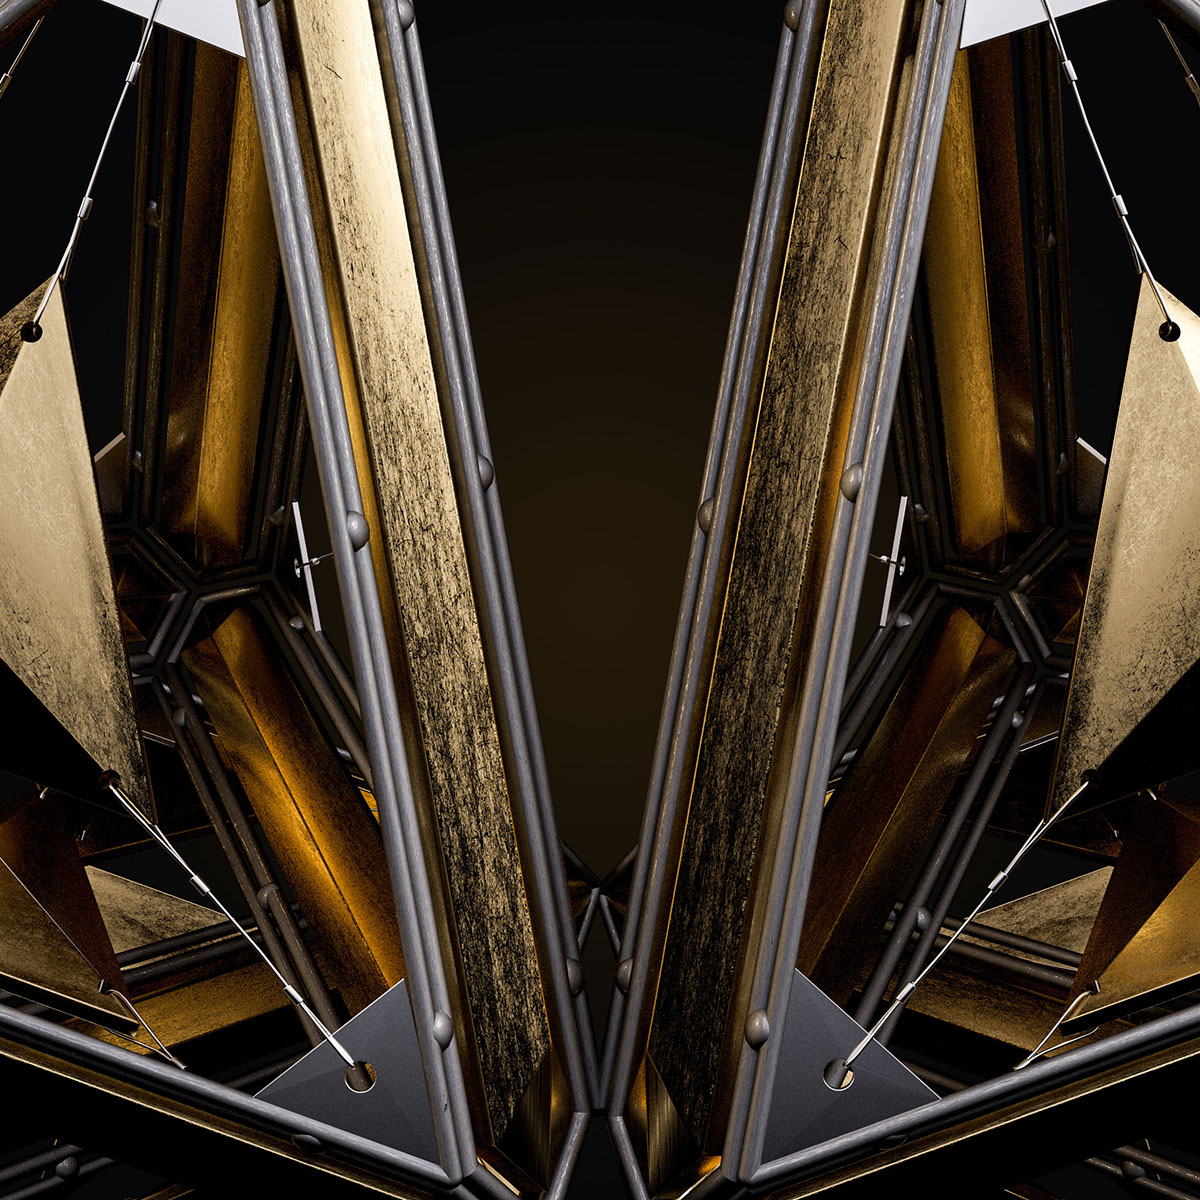 rendering CGI cinema4d corona renderer 3D post-production modeling Swarovski